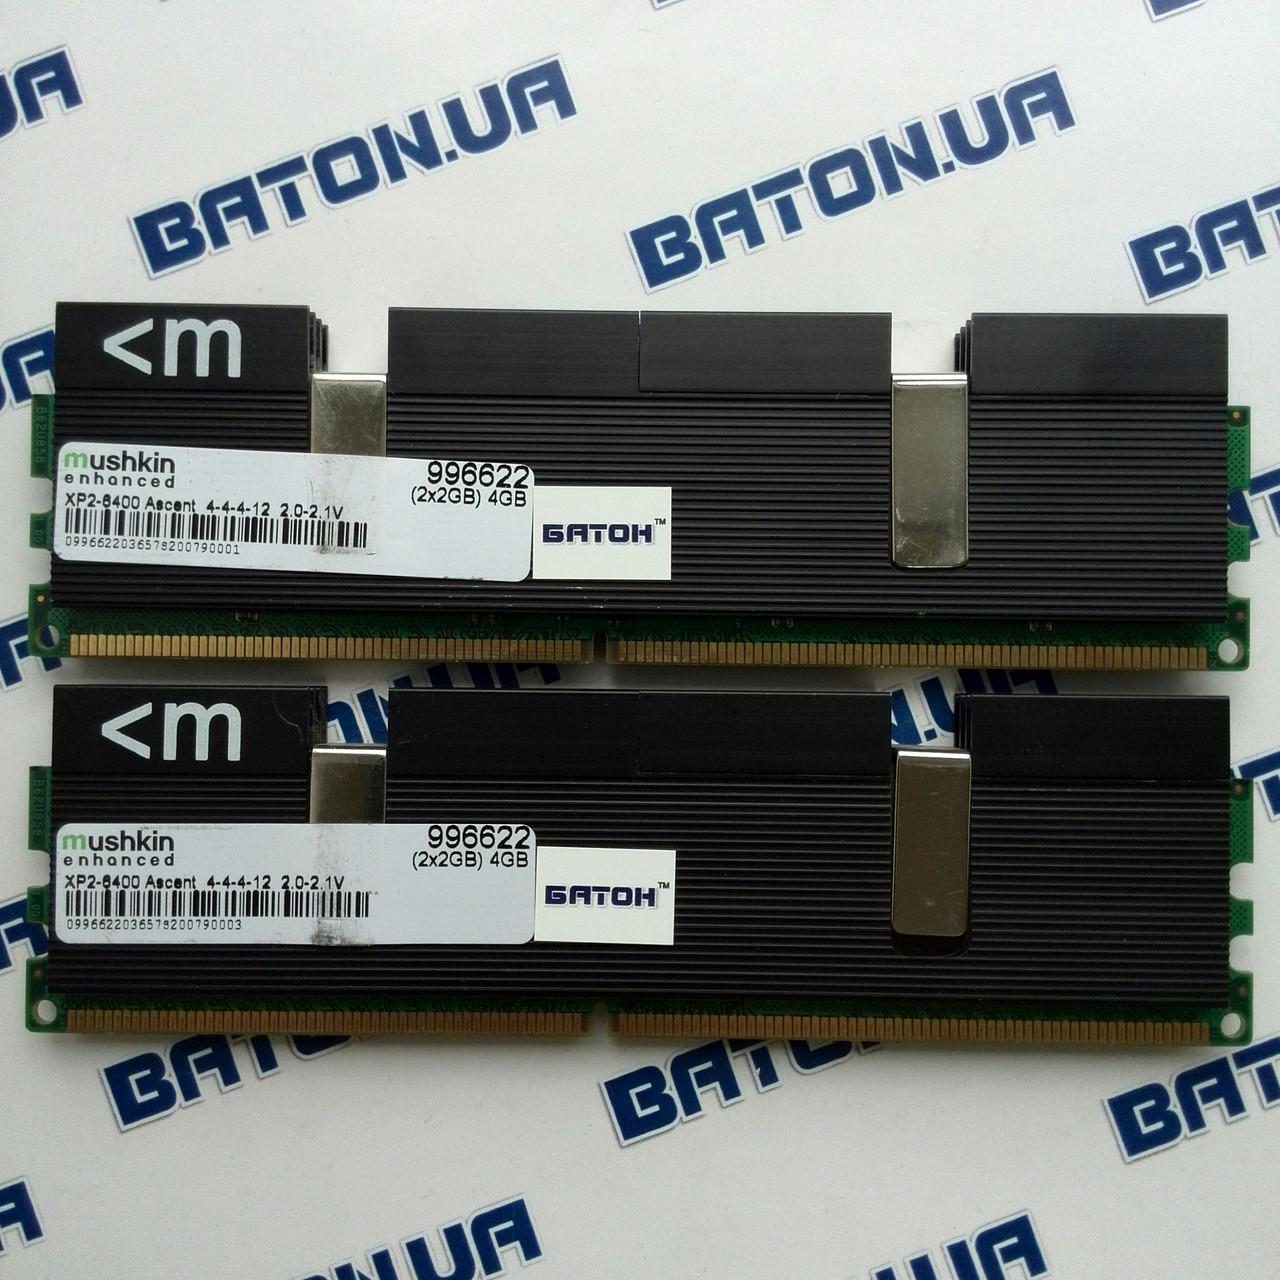 Игровая оперативная память Mushkin DDR2 4Gb KIT of 2 800MHz PC2 6400U CL4 (996622)